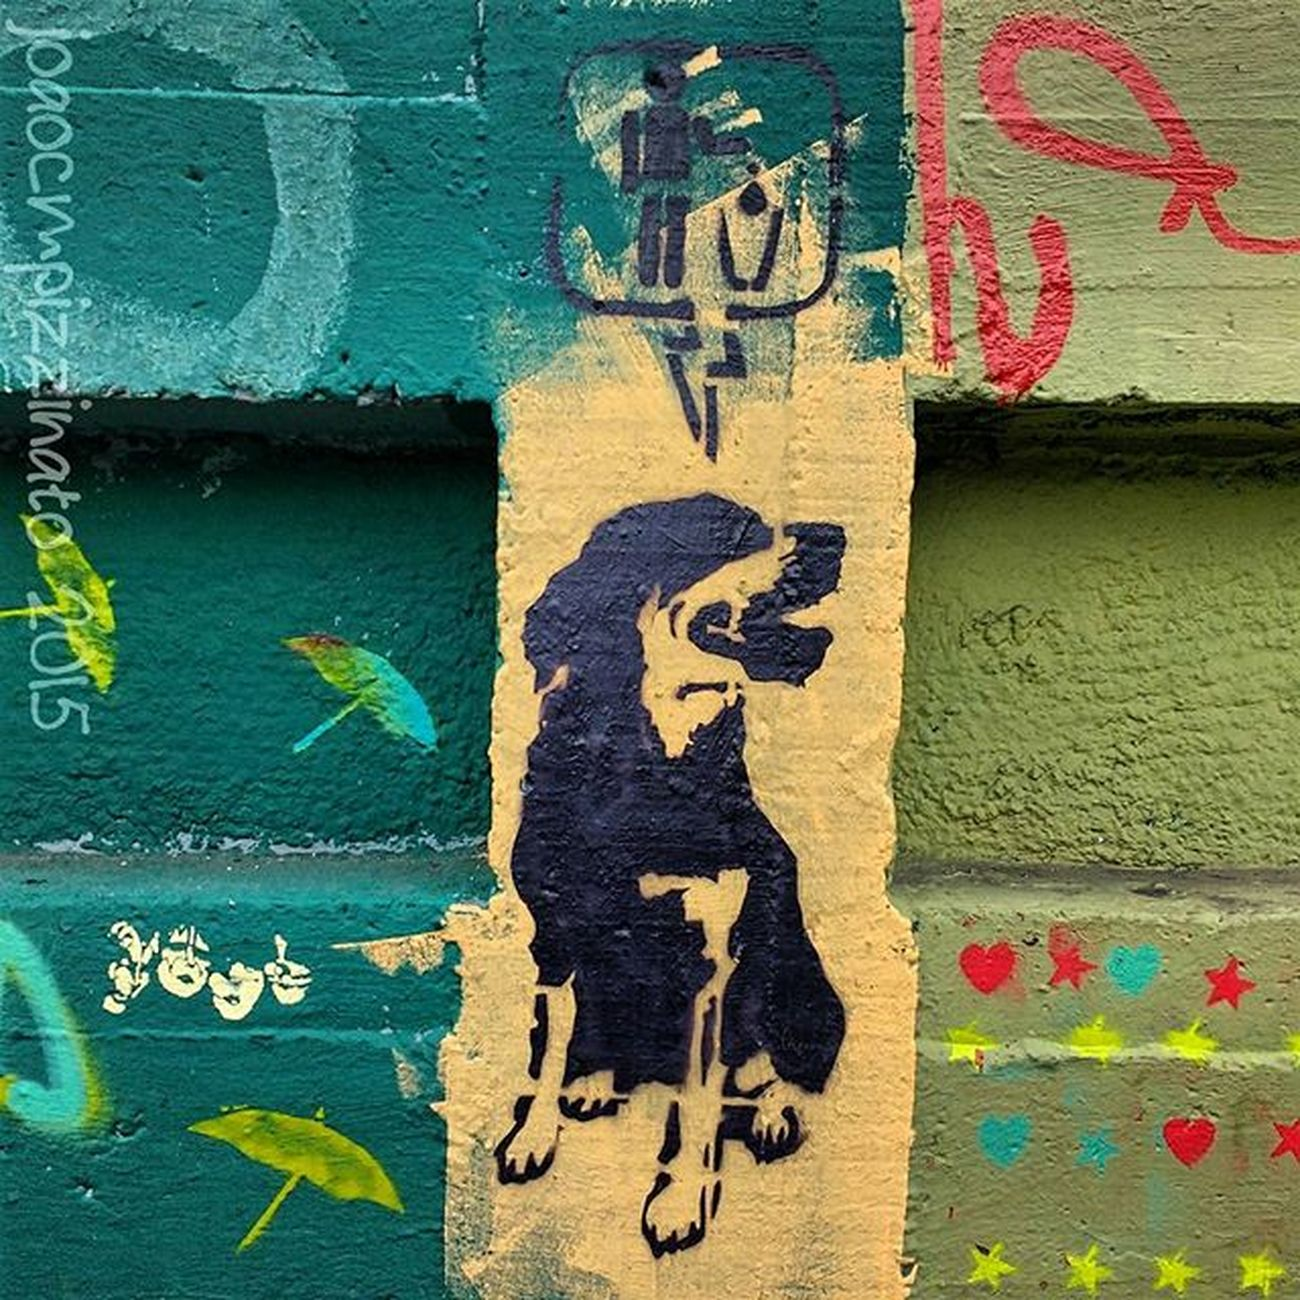 Graffiti Graffitiart Art Streetart UrbanART Streetphotography Urban Streetphoto_brasil Colors City Belavista Saopaulo Brasil Photograph Ig_asylum Tv_urbex Flaming_abstracts Mundoruasp Olhonaruasp